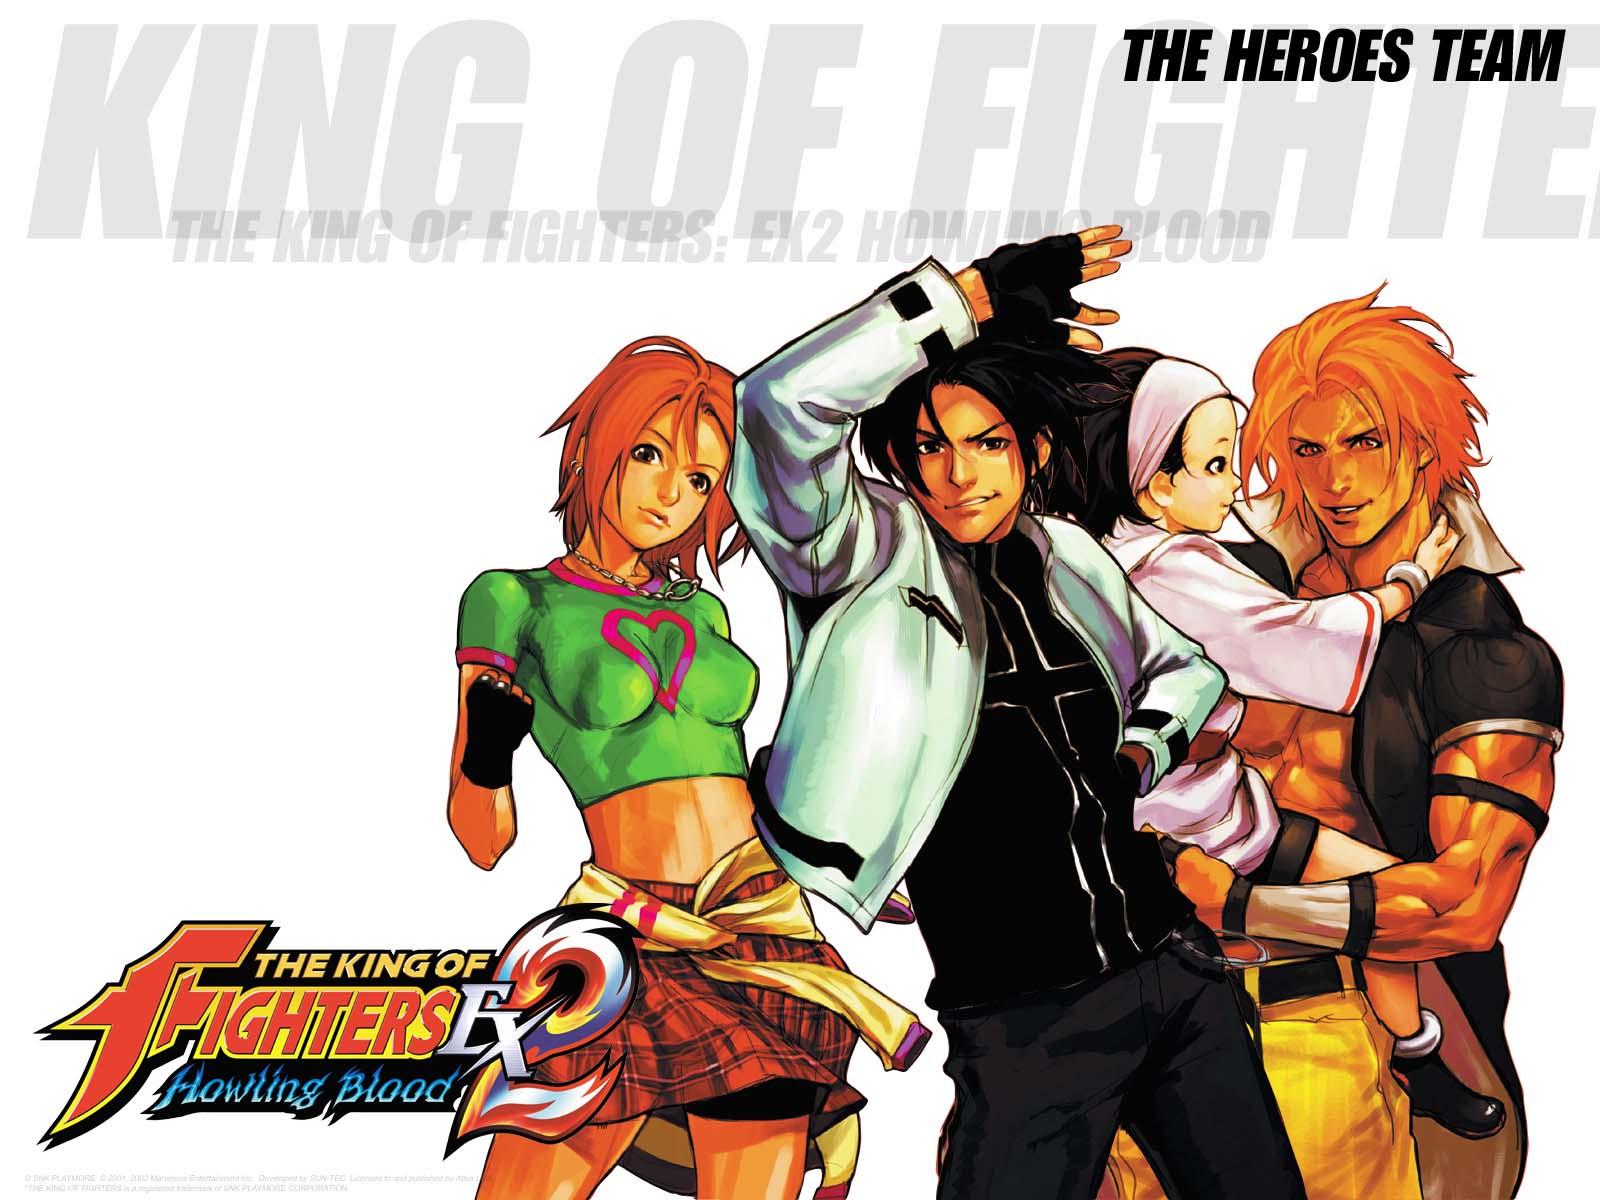 http://3.bp.blogspot.com/-x5Z-7KEIhyY/Tk9dySGI-8I/AAAAAAAAZF0/ejIgenhunOI/s1600/kof_wallpaper_hero.jpg